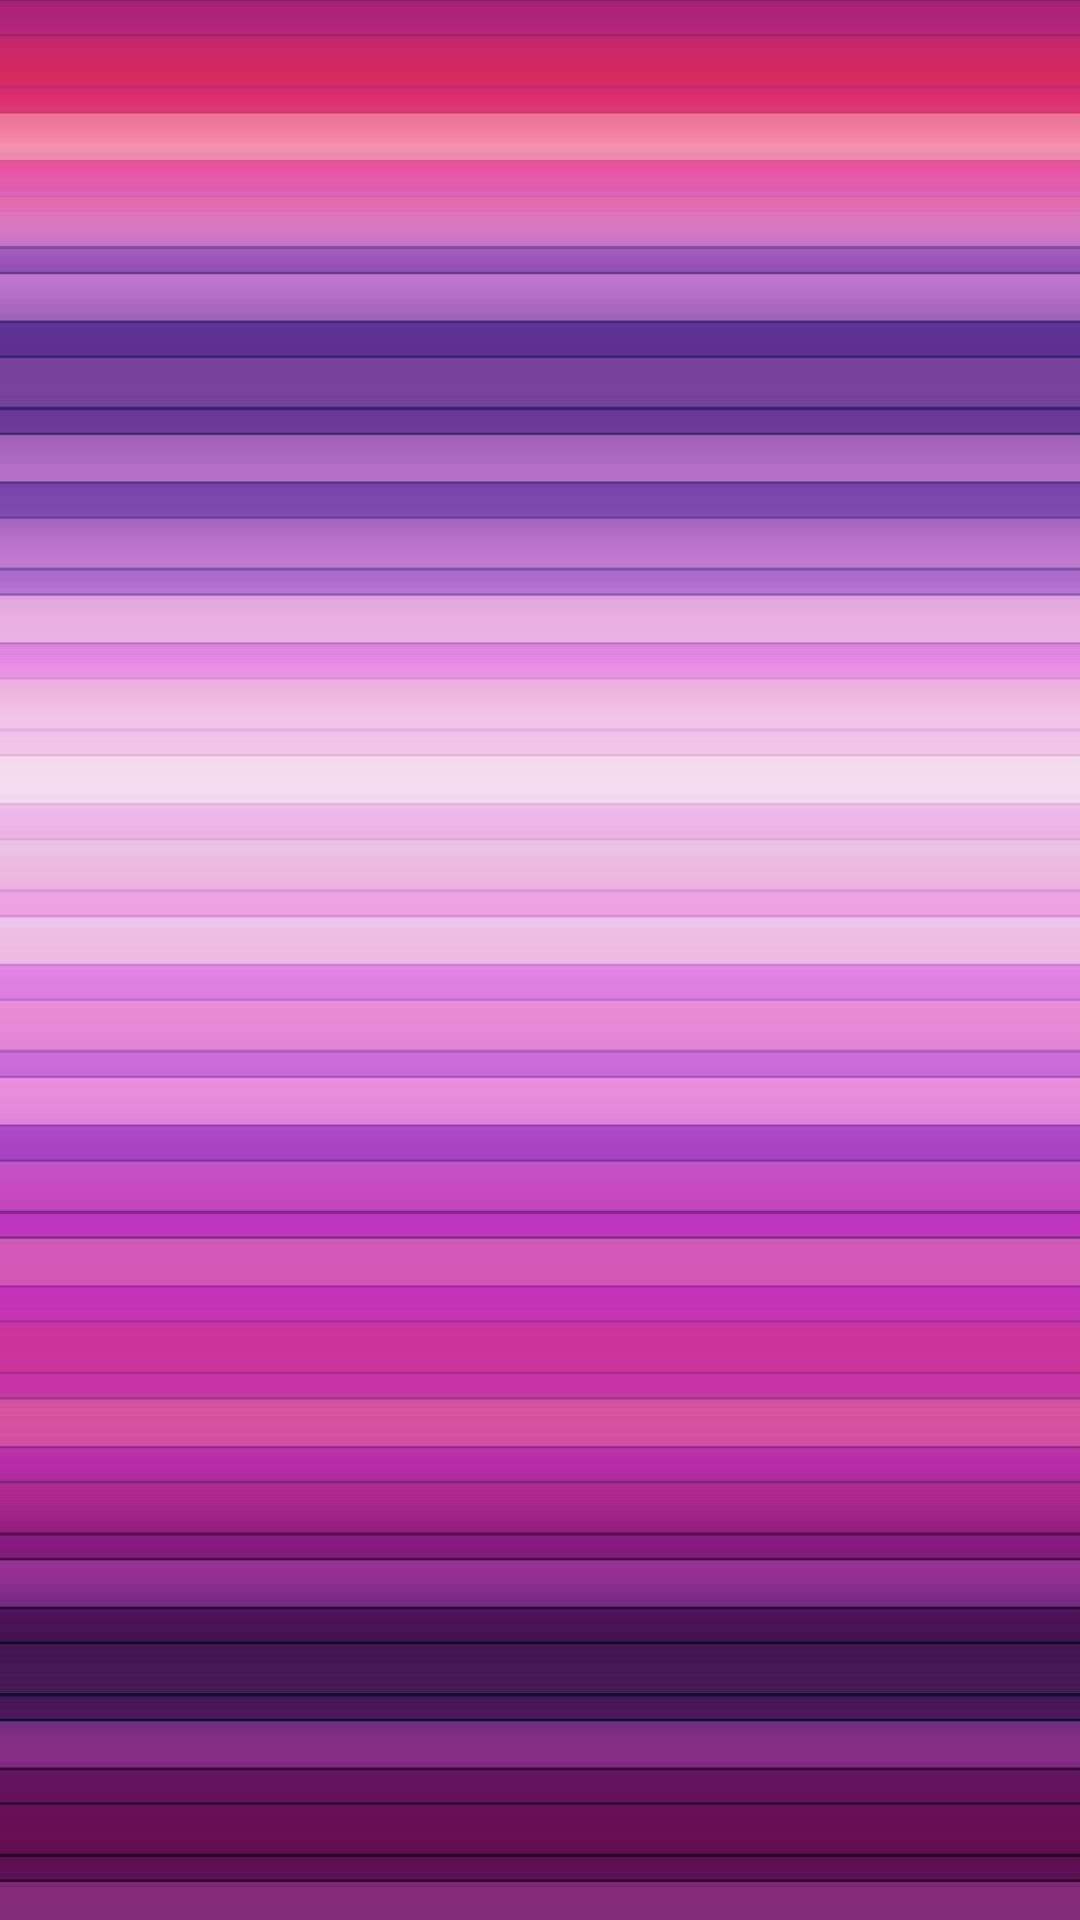 Fondo Rosado Morado Pink Purple Wallpaper Stripes Fondos De